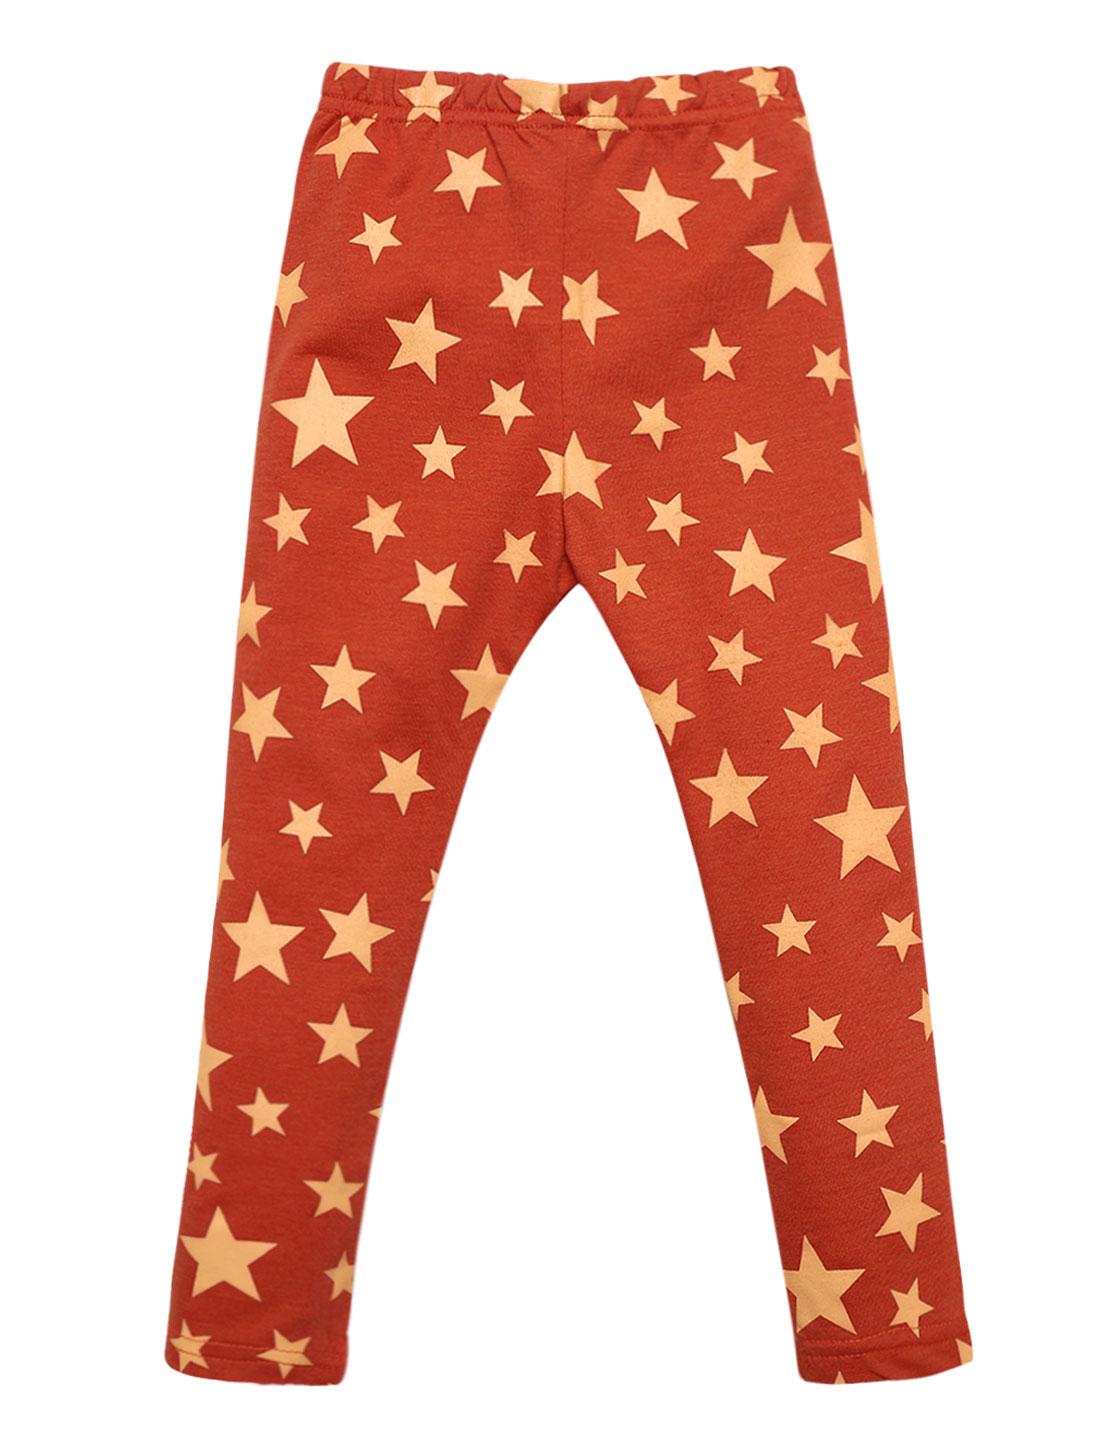 Girls Stars Pattern Elastic Waist Stretchy Casual Leggings Orange Red 4T